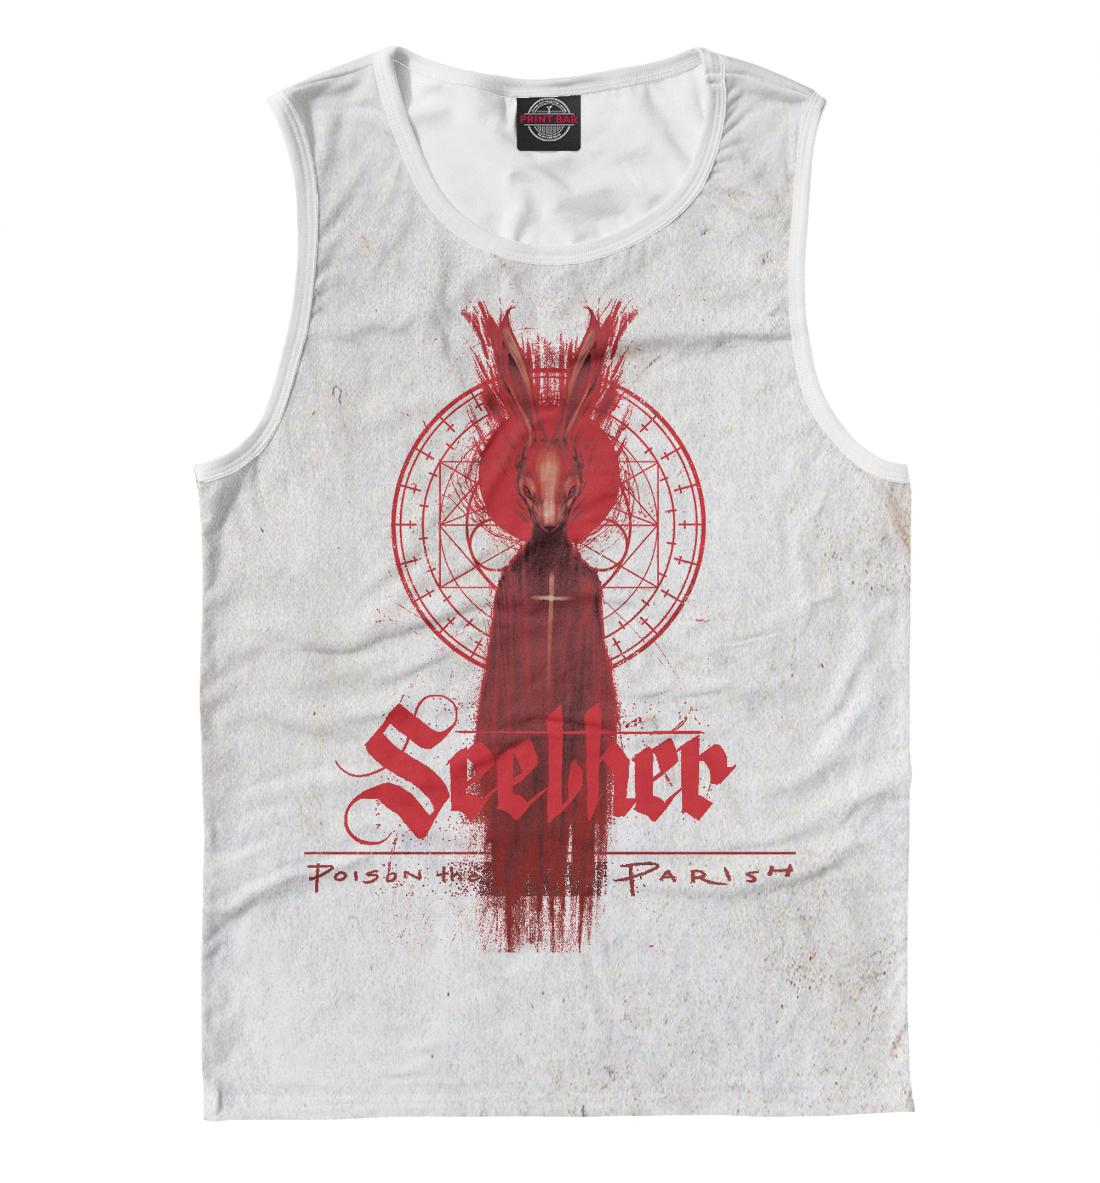 Купить Seether, Printbar, Майки, MZK-670967-may-2